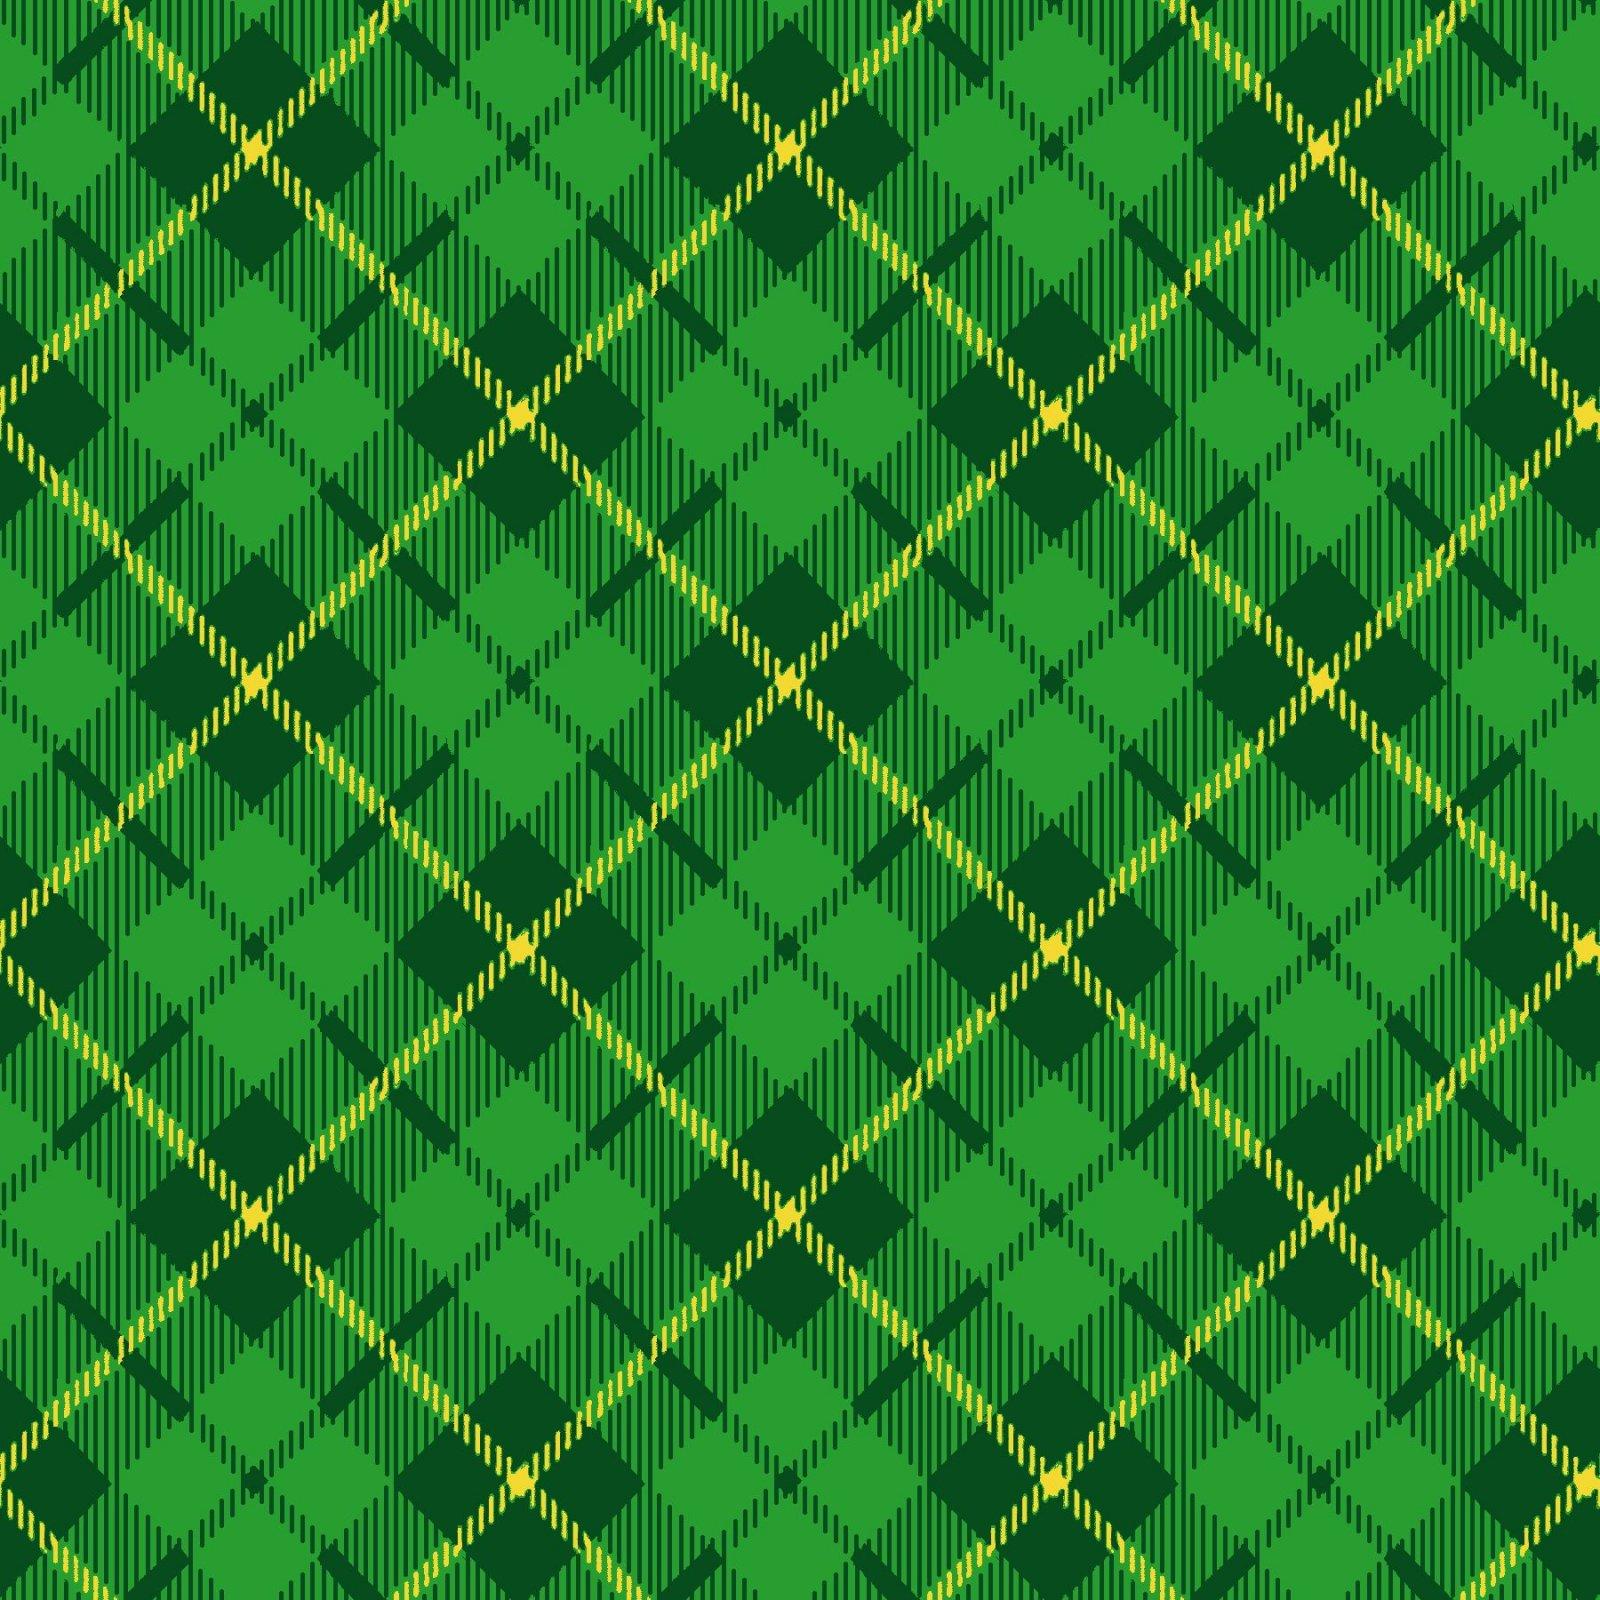 HG-Pot of Gold 9370-66 Green - Diagonal Plaid